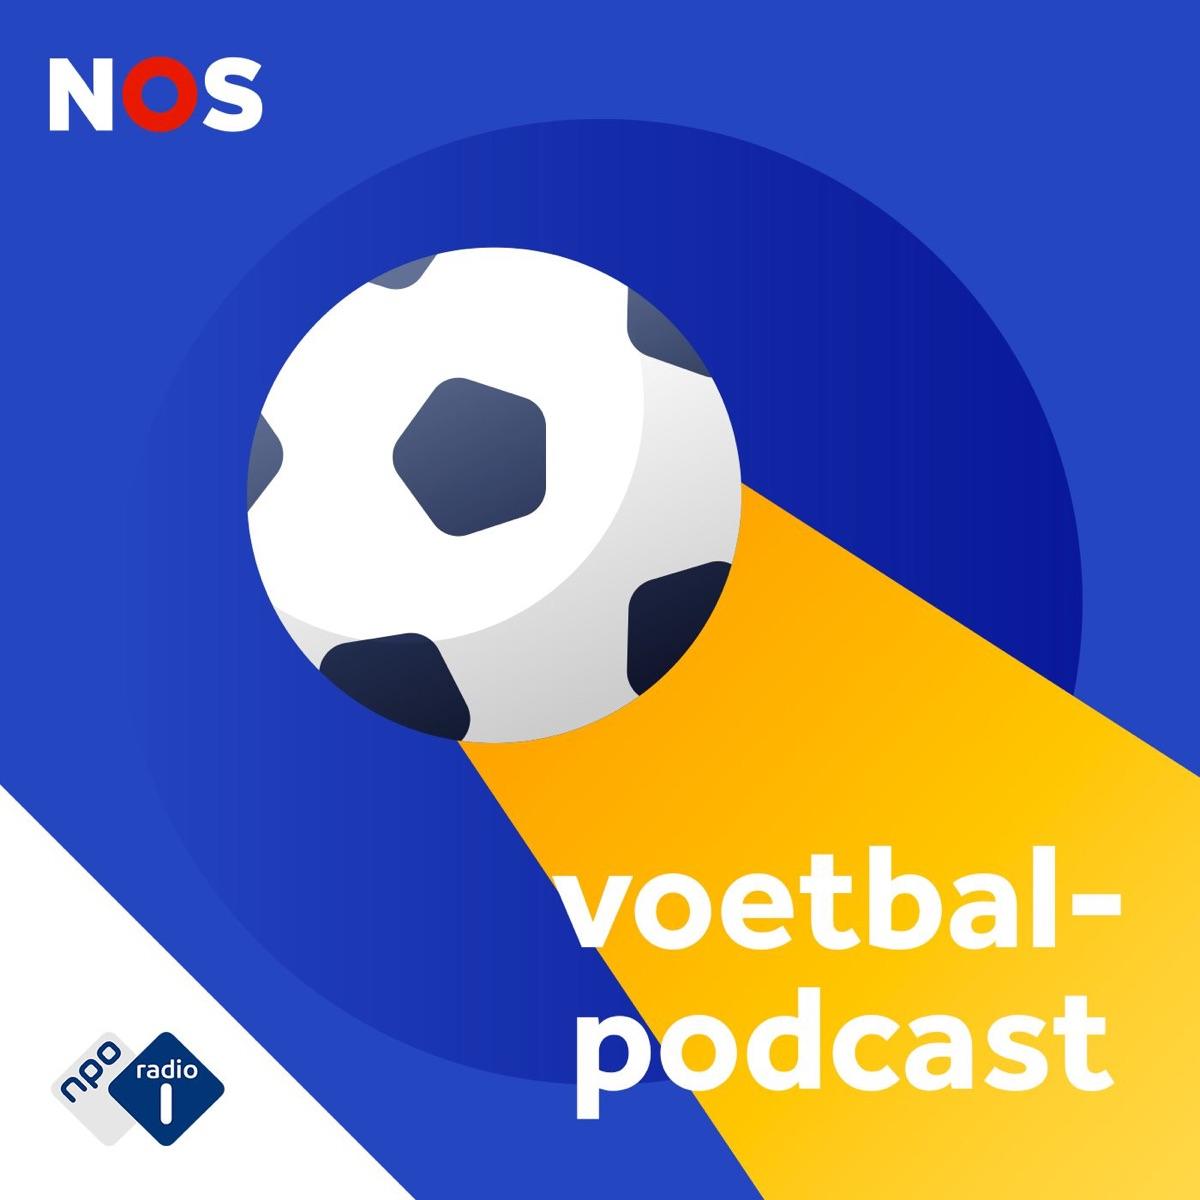 NOS Voetbalpodcast